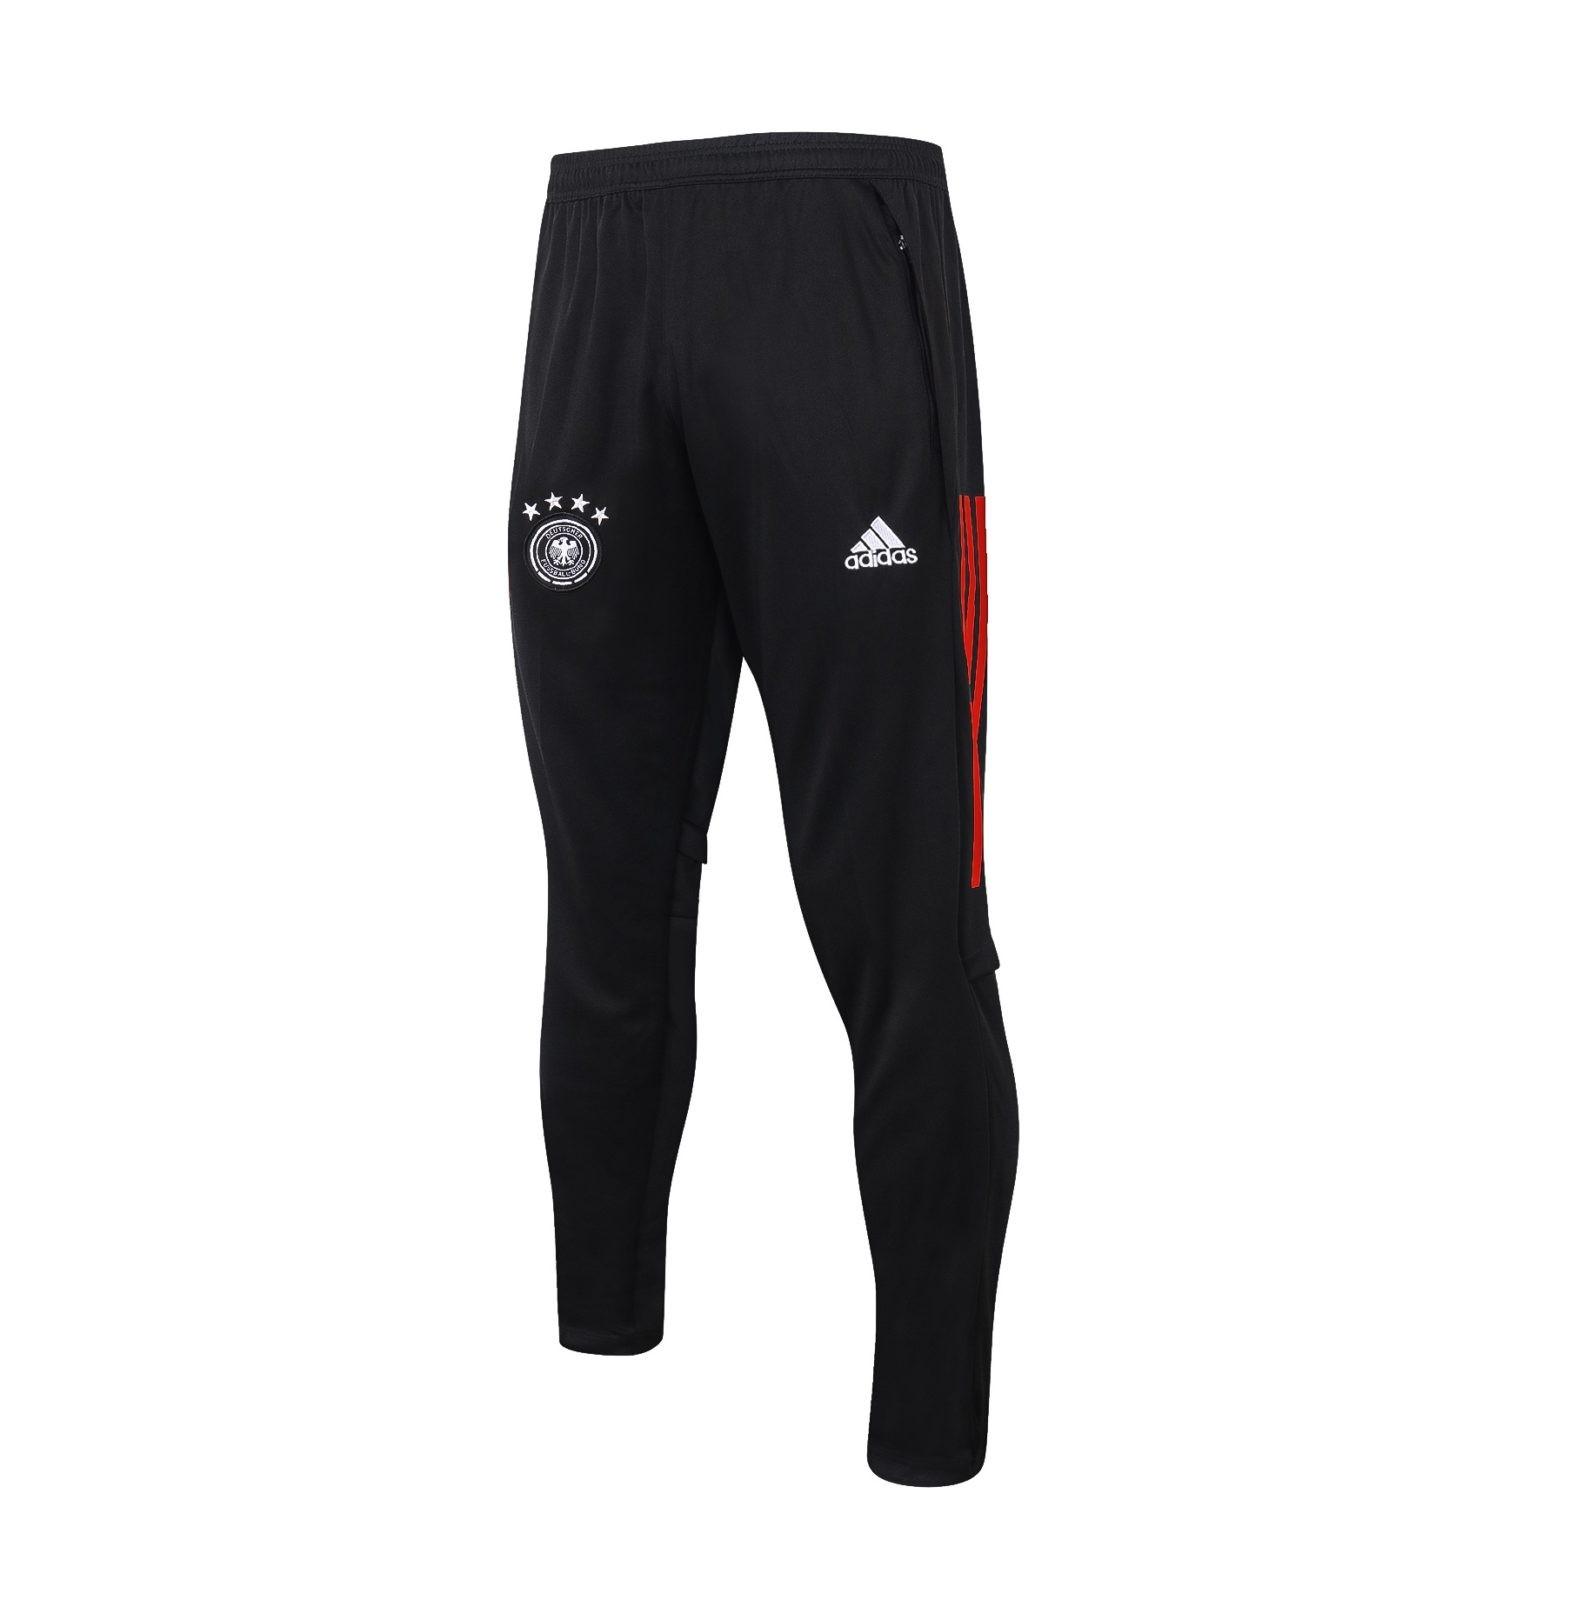 Штаны Баварии Мюнхен сезон 2020-2021